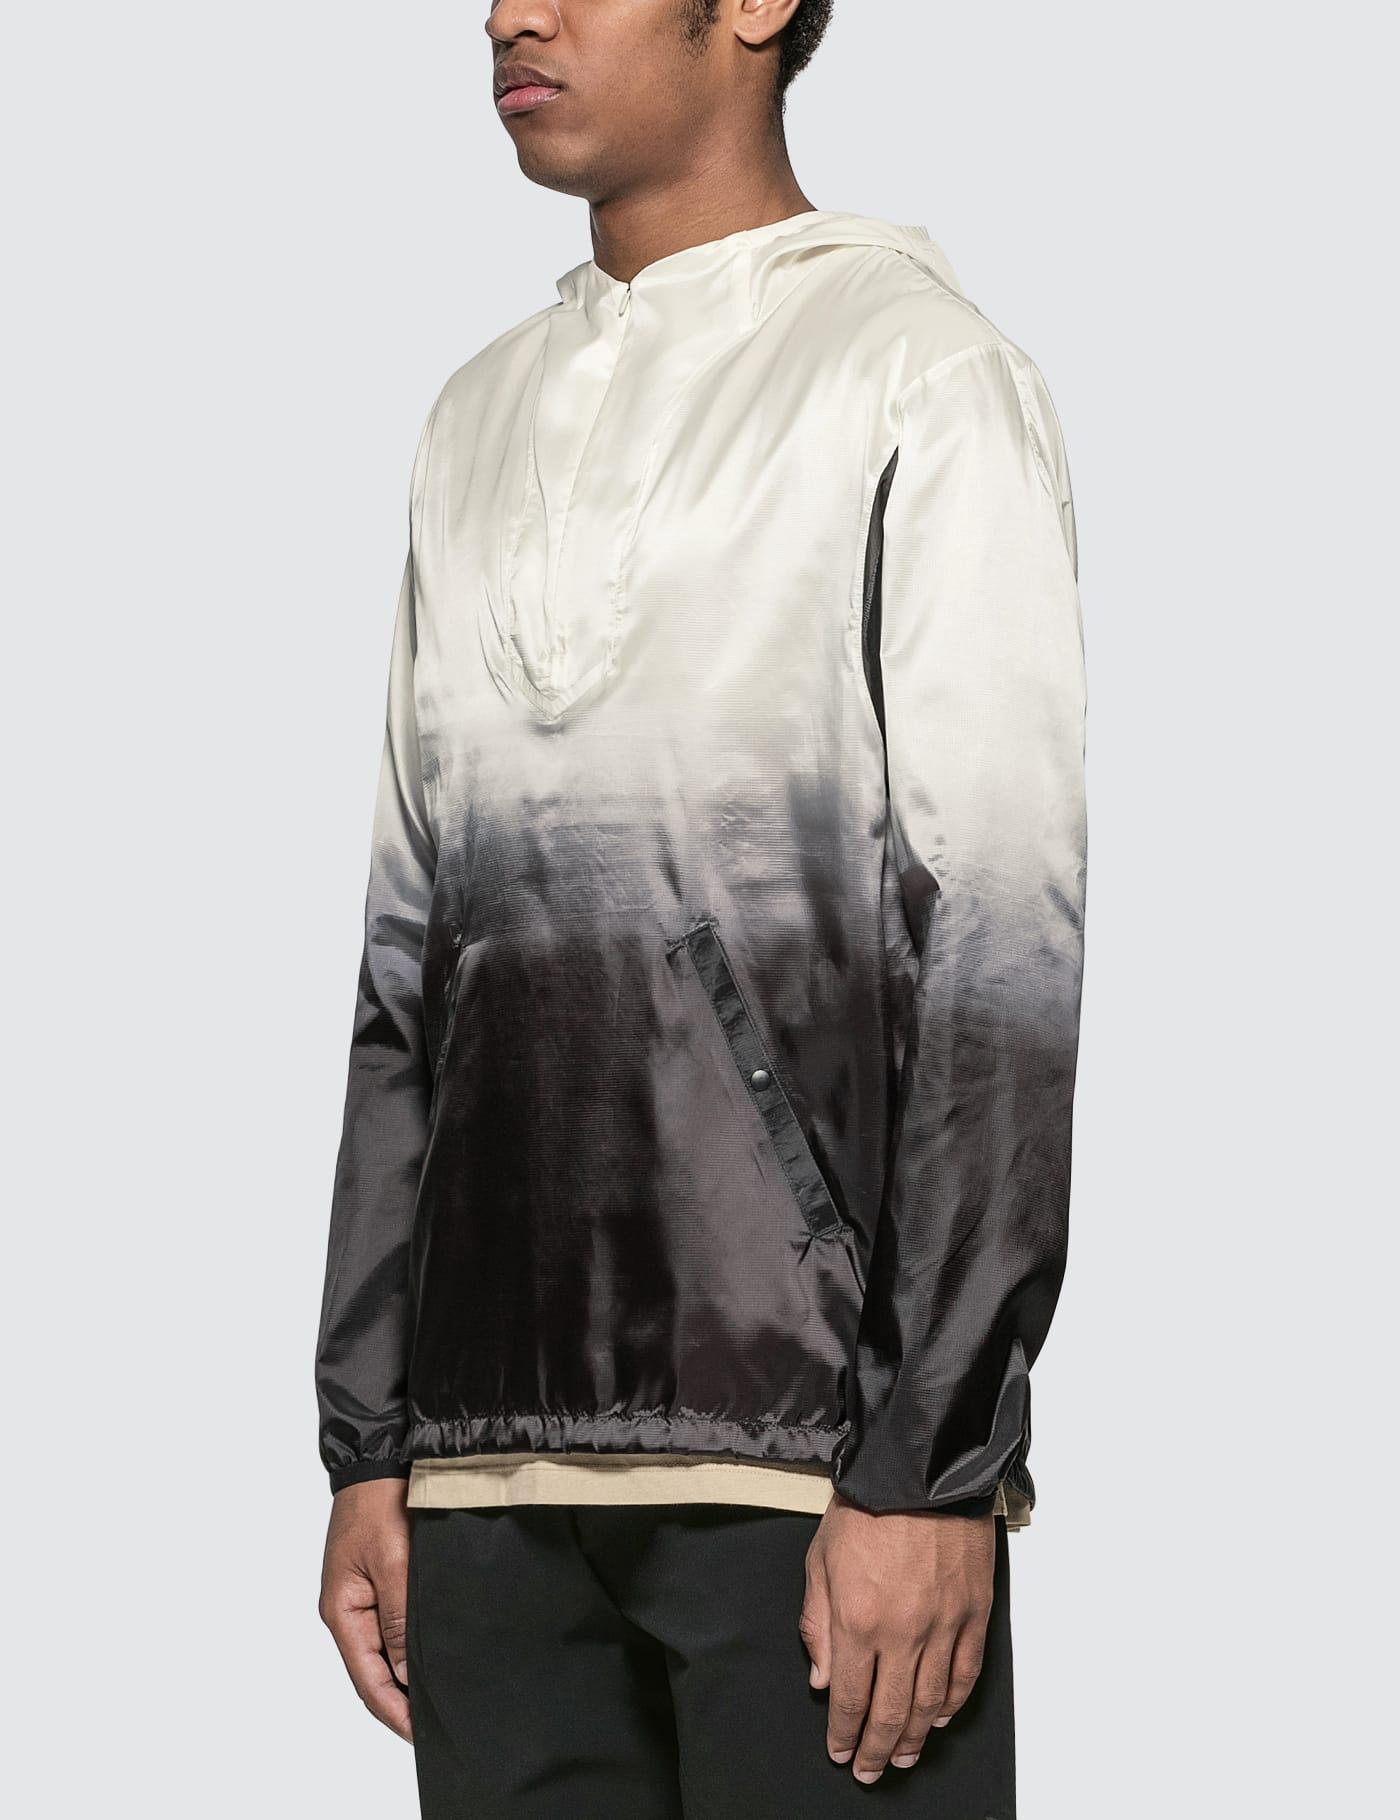 asics x reigning champ light jacket